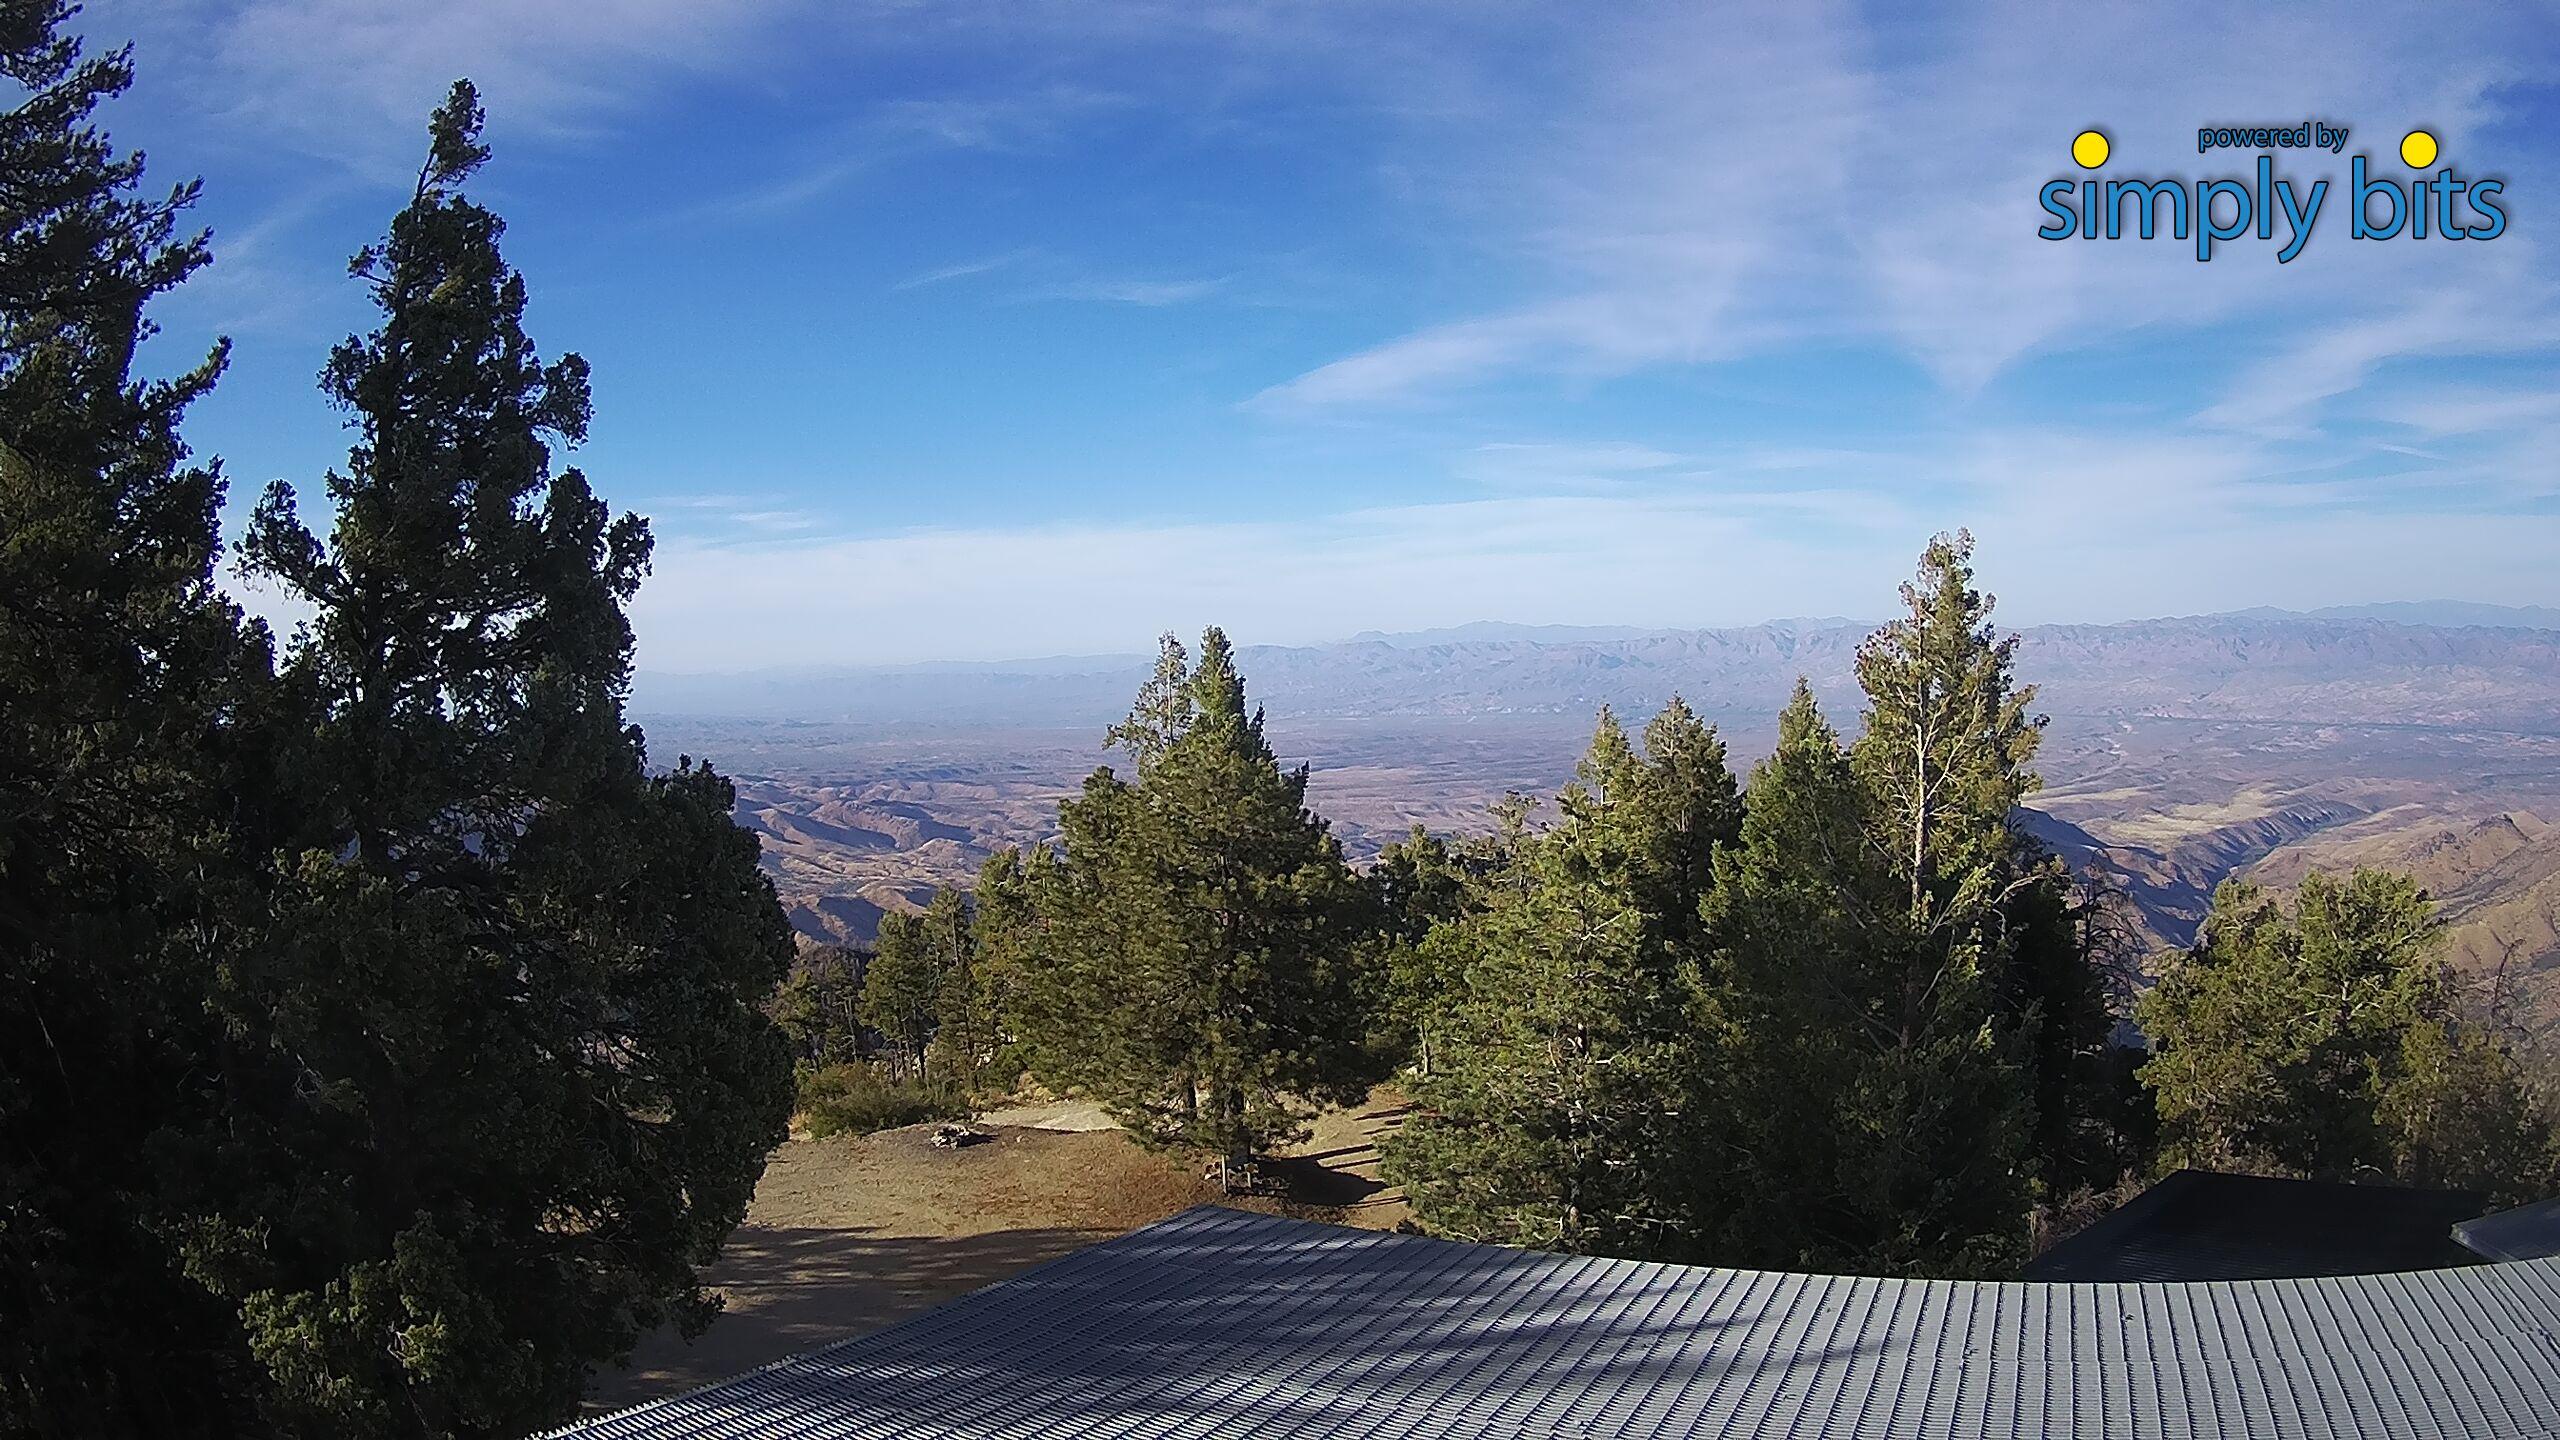 Mount Bigelow Northeast - Phoenix and Arizona